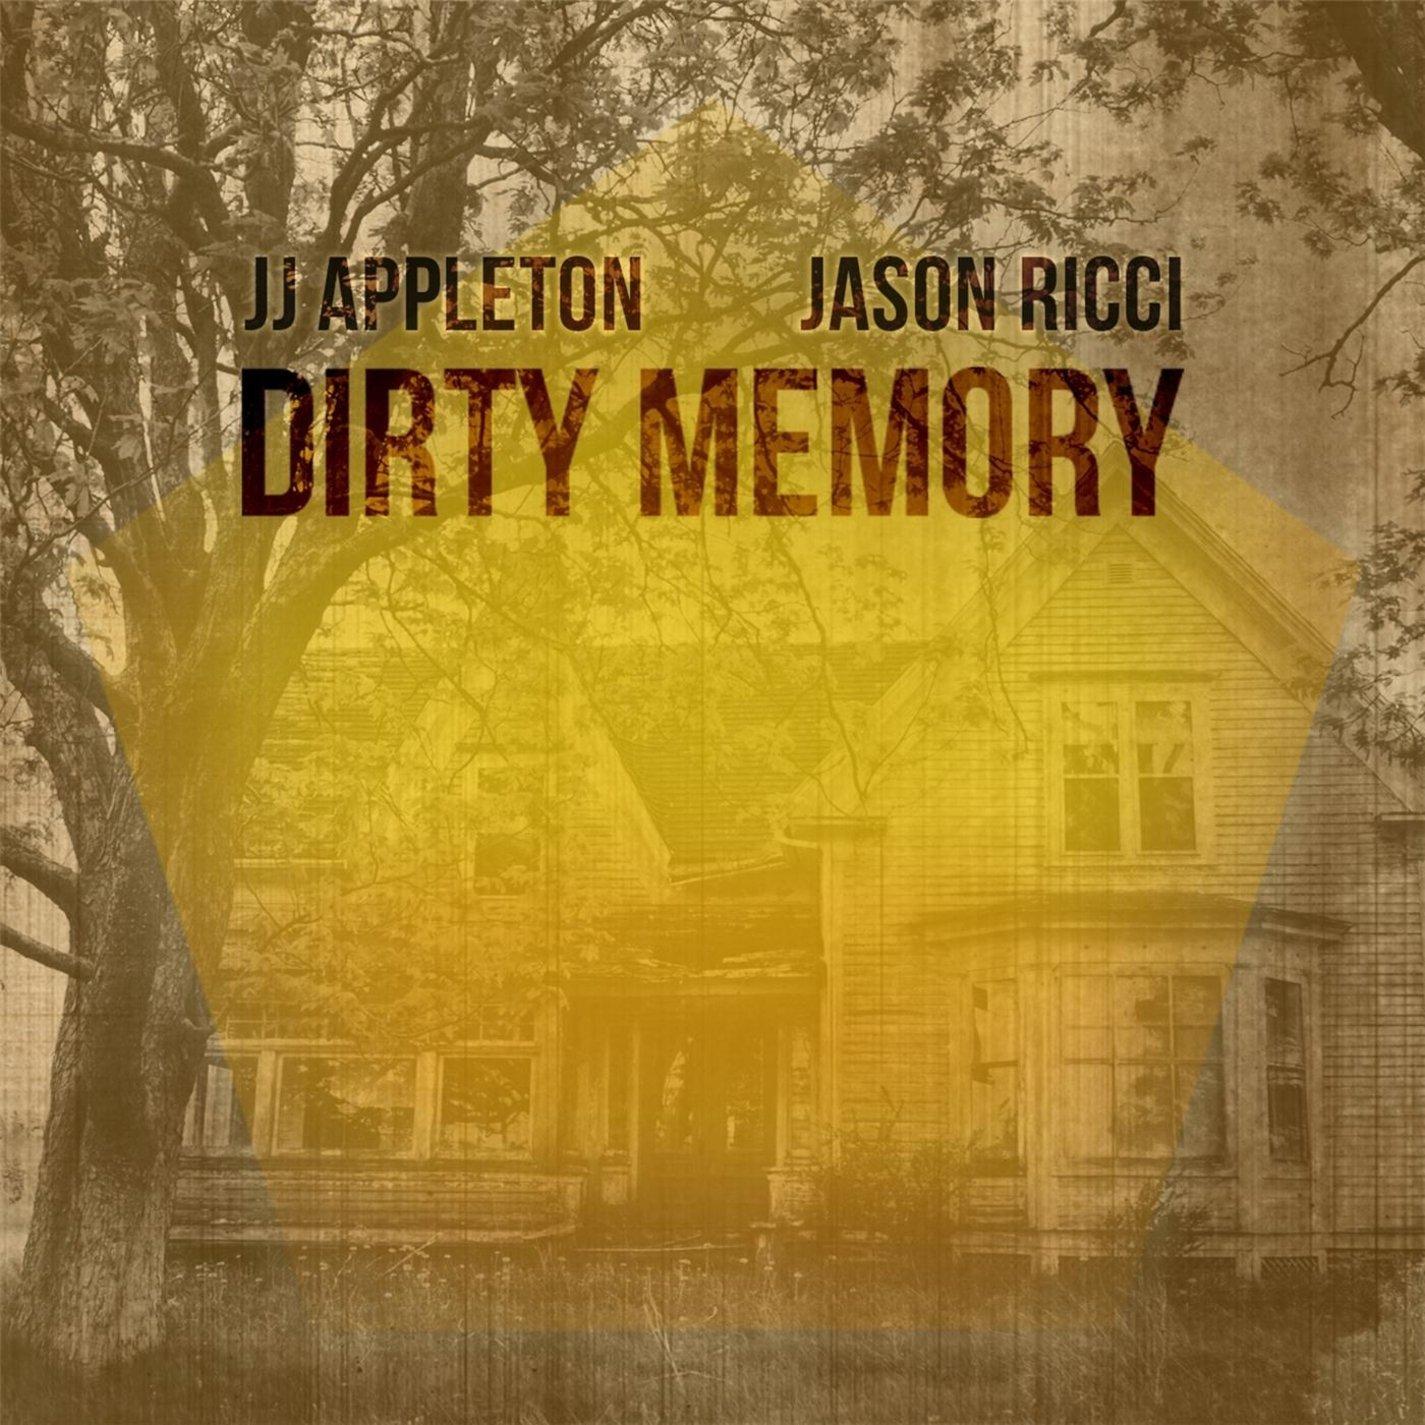 JJ APPLETON & JASON RICCI – Can't believe it's thisgood